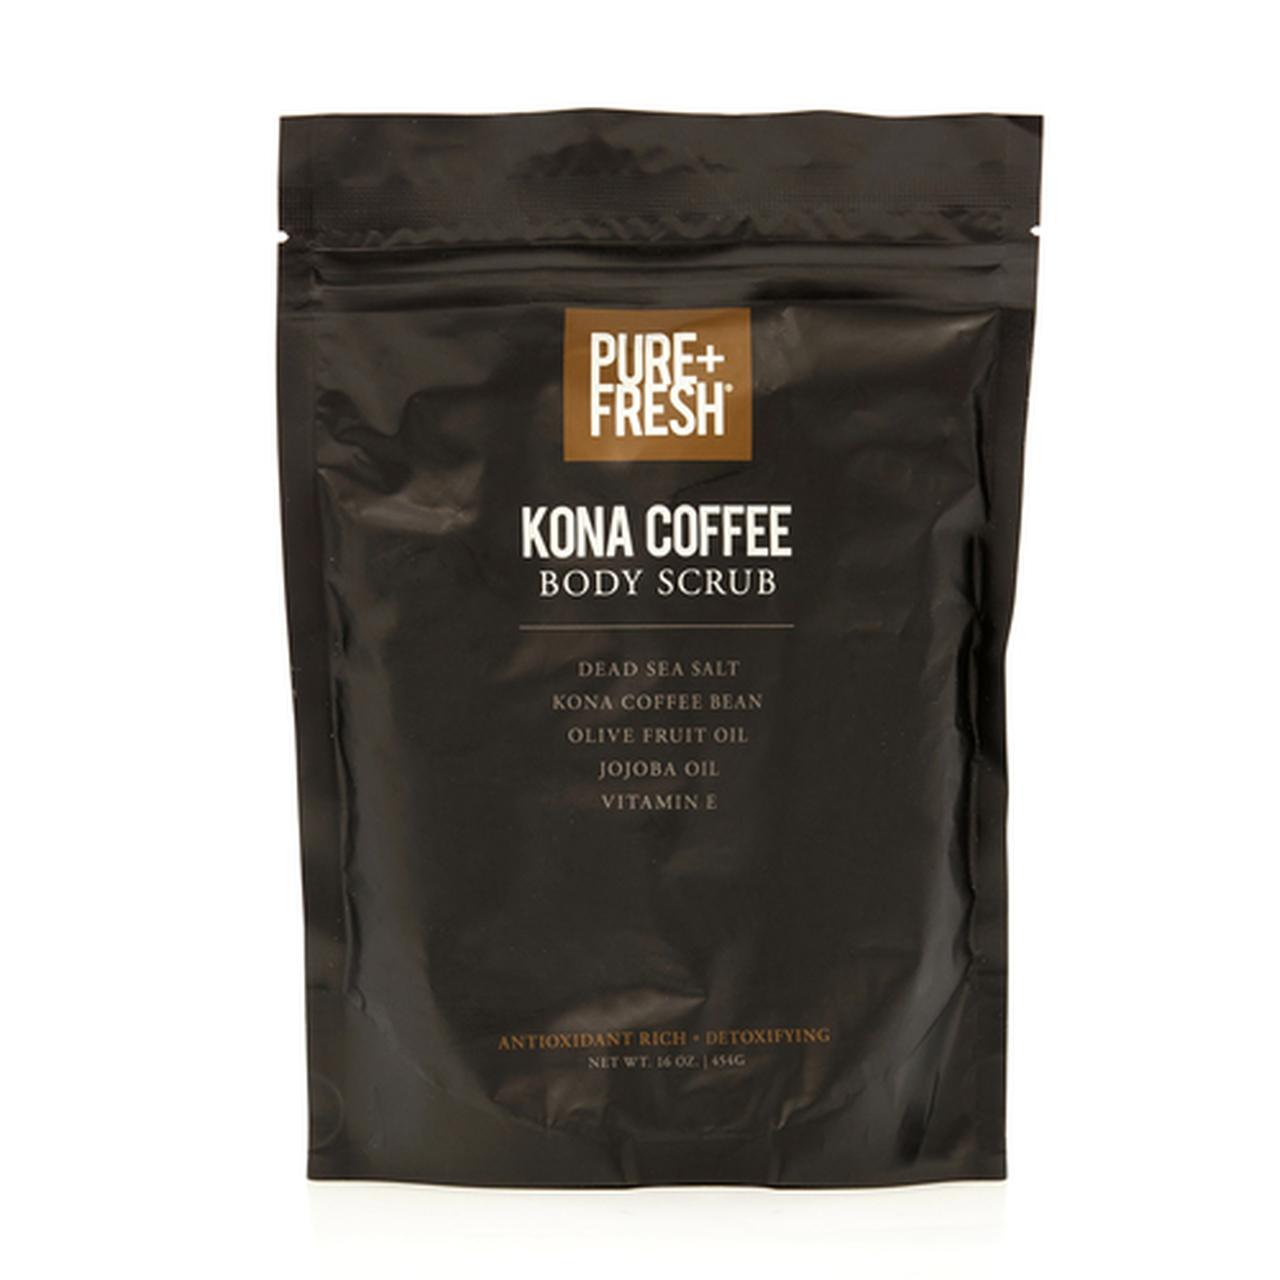 16oz Packaging of Pure+Fresh Kona Coffee Body Scrub